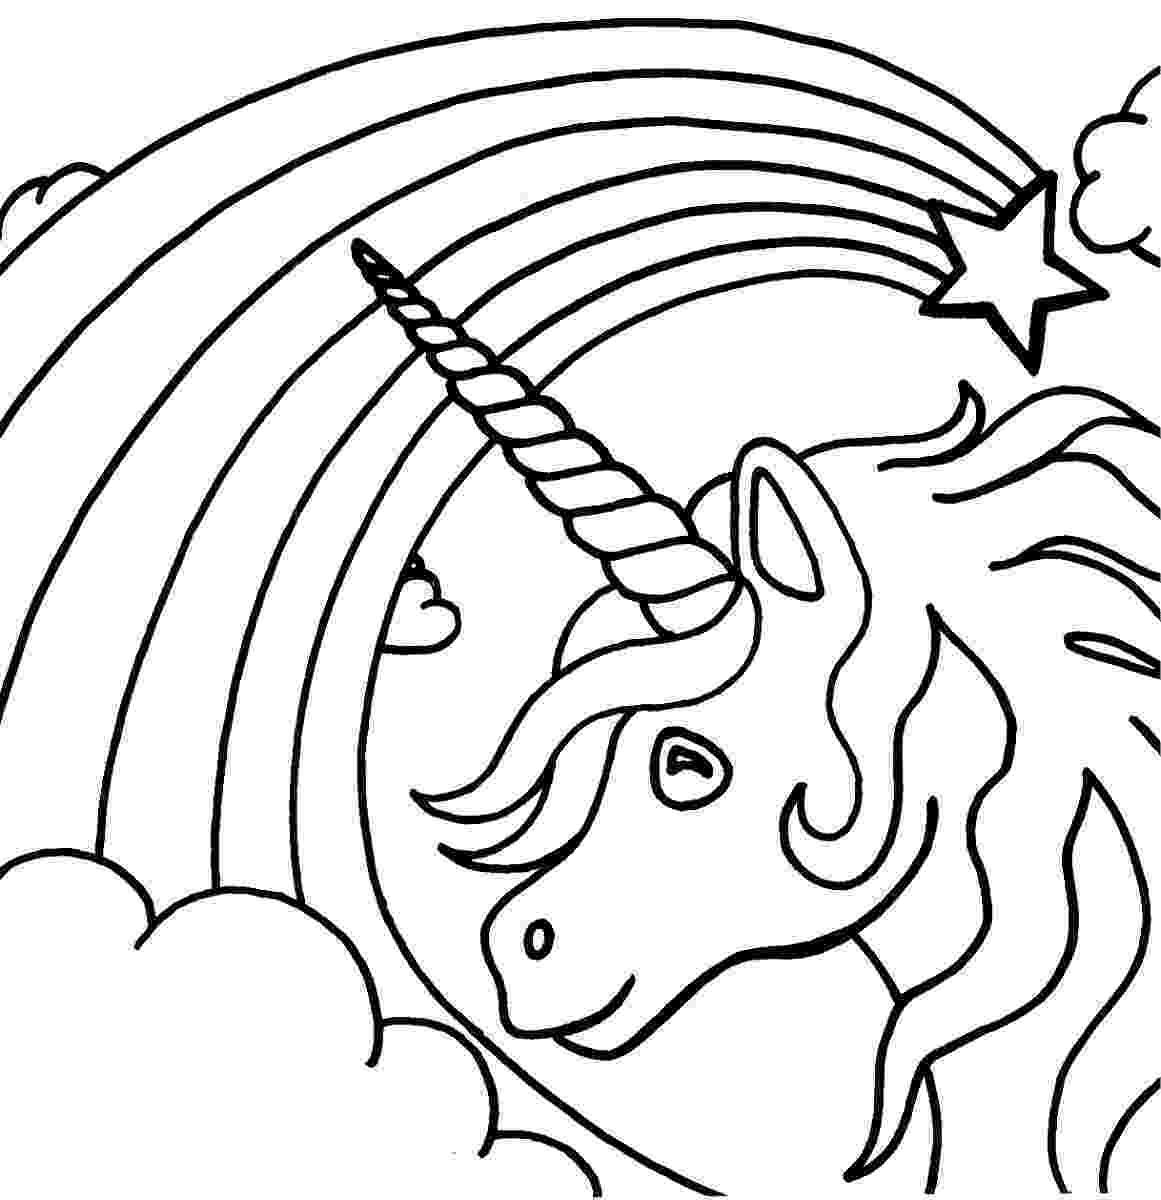 coloring pages unicorns rainbows unicorn coloring page unicorns and rainbowsparty unicorns pages rainbows coloring